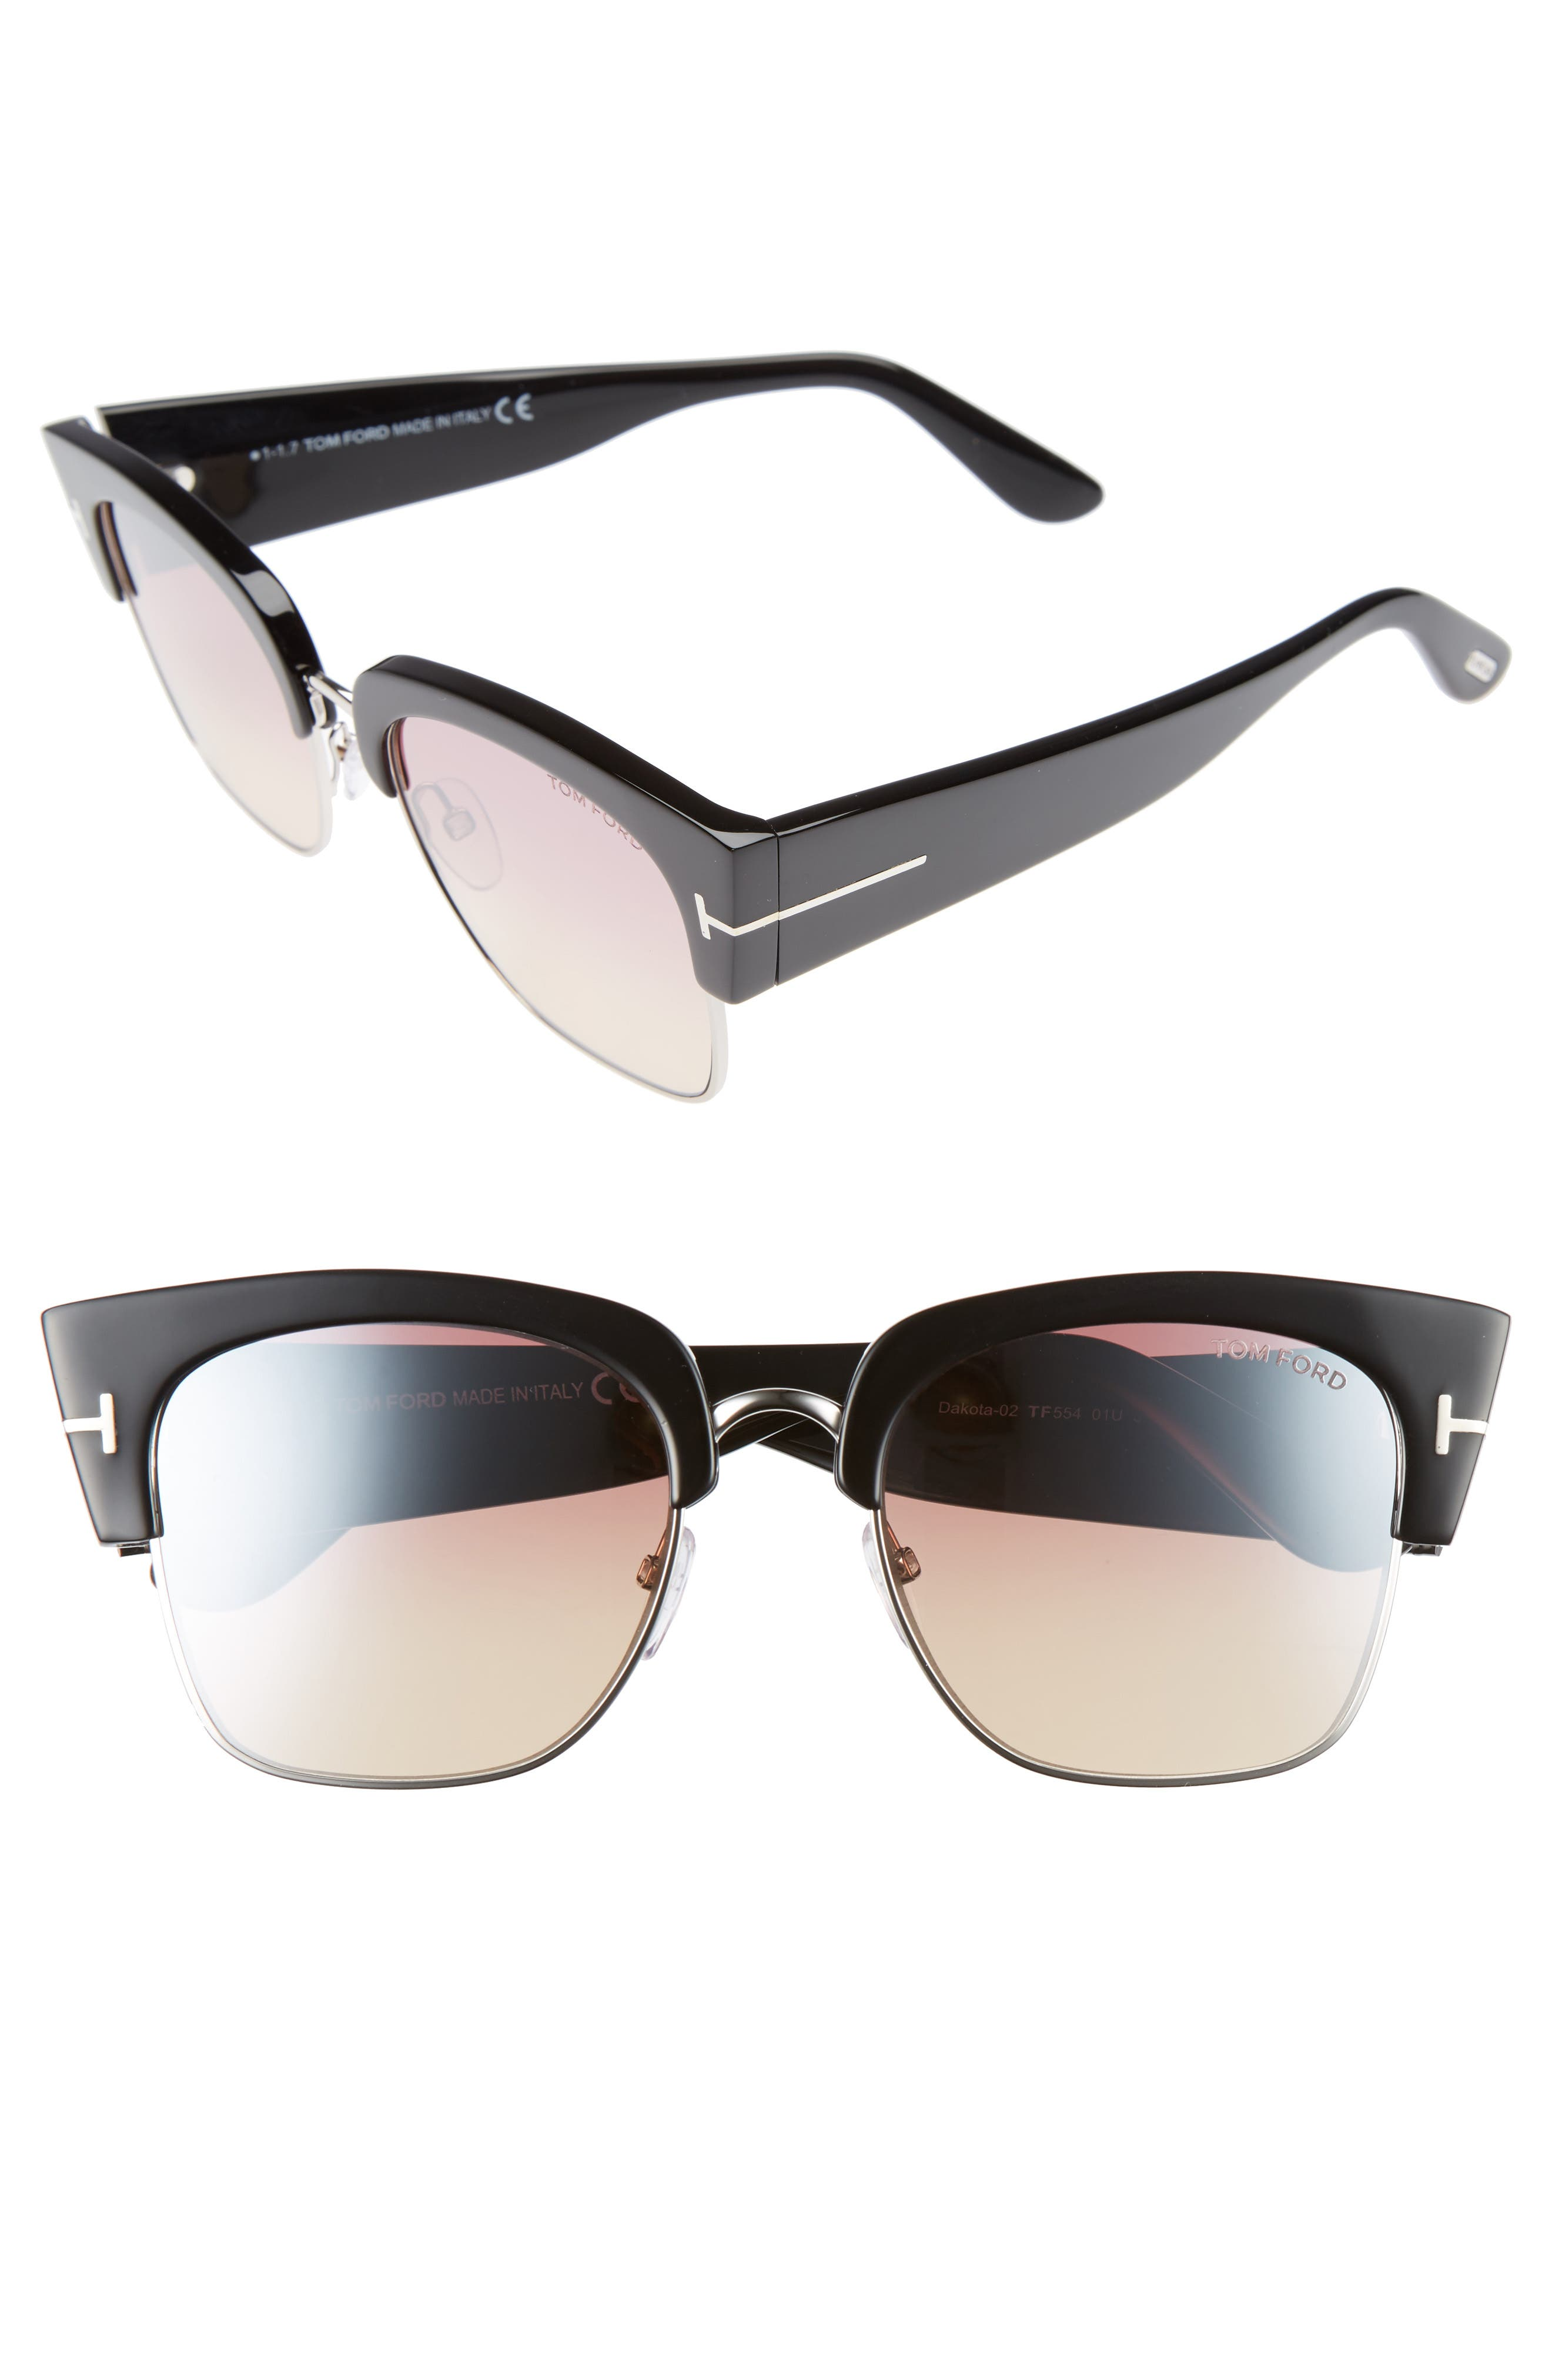 Main Image - Tom Ford Dakota 55mm Gradient Square Sunglasses